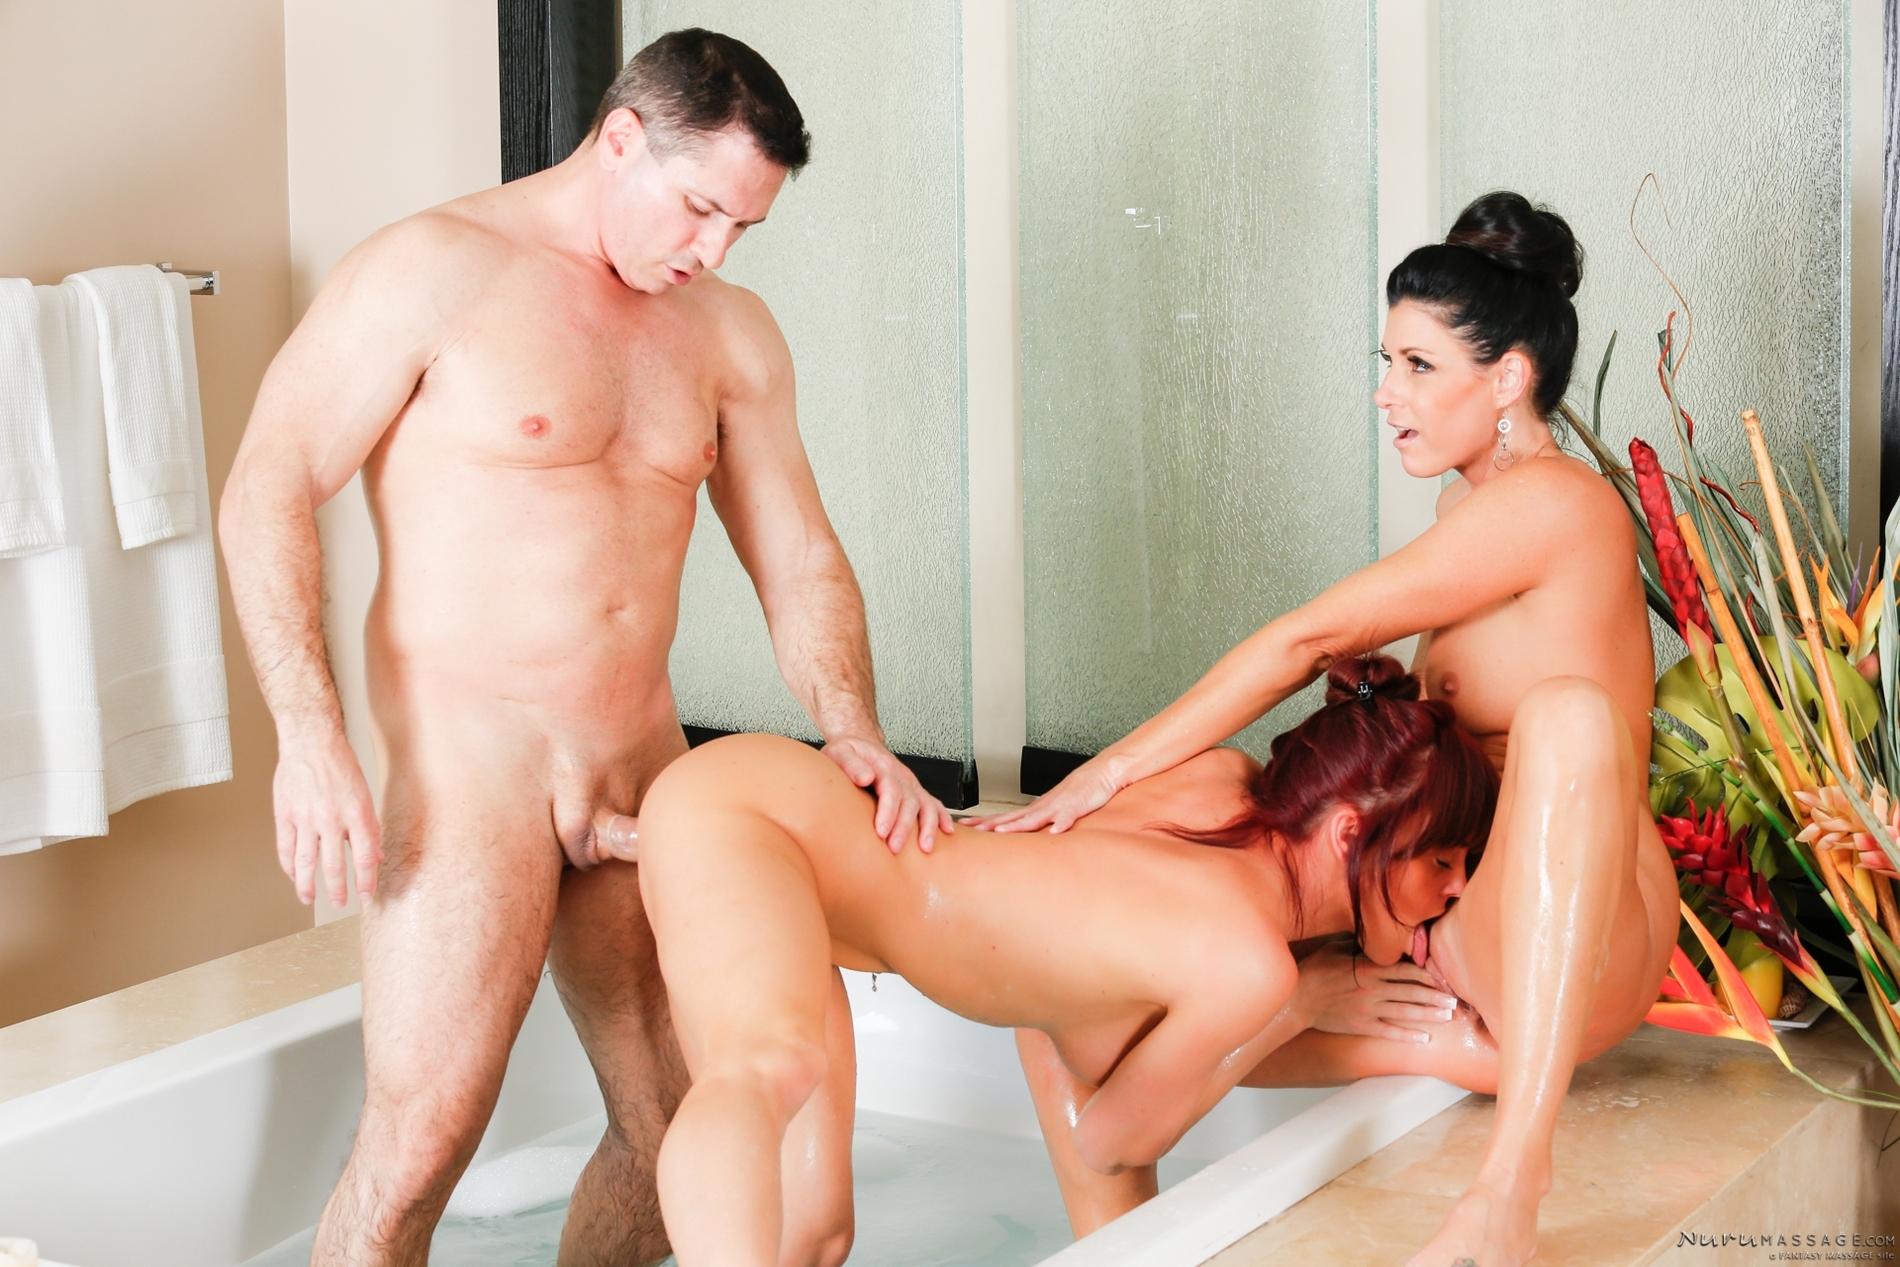 Massage turns to sex fest